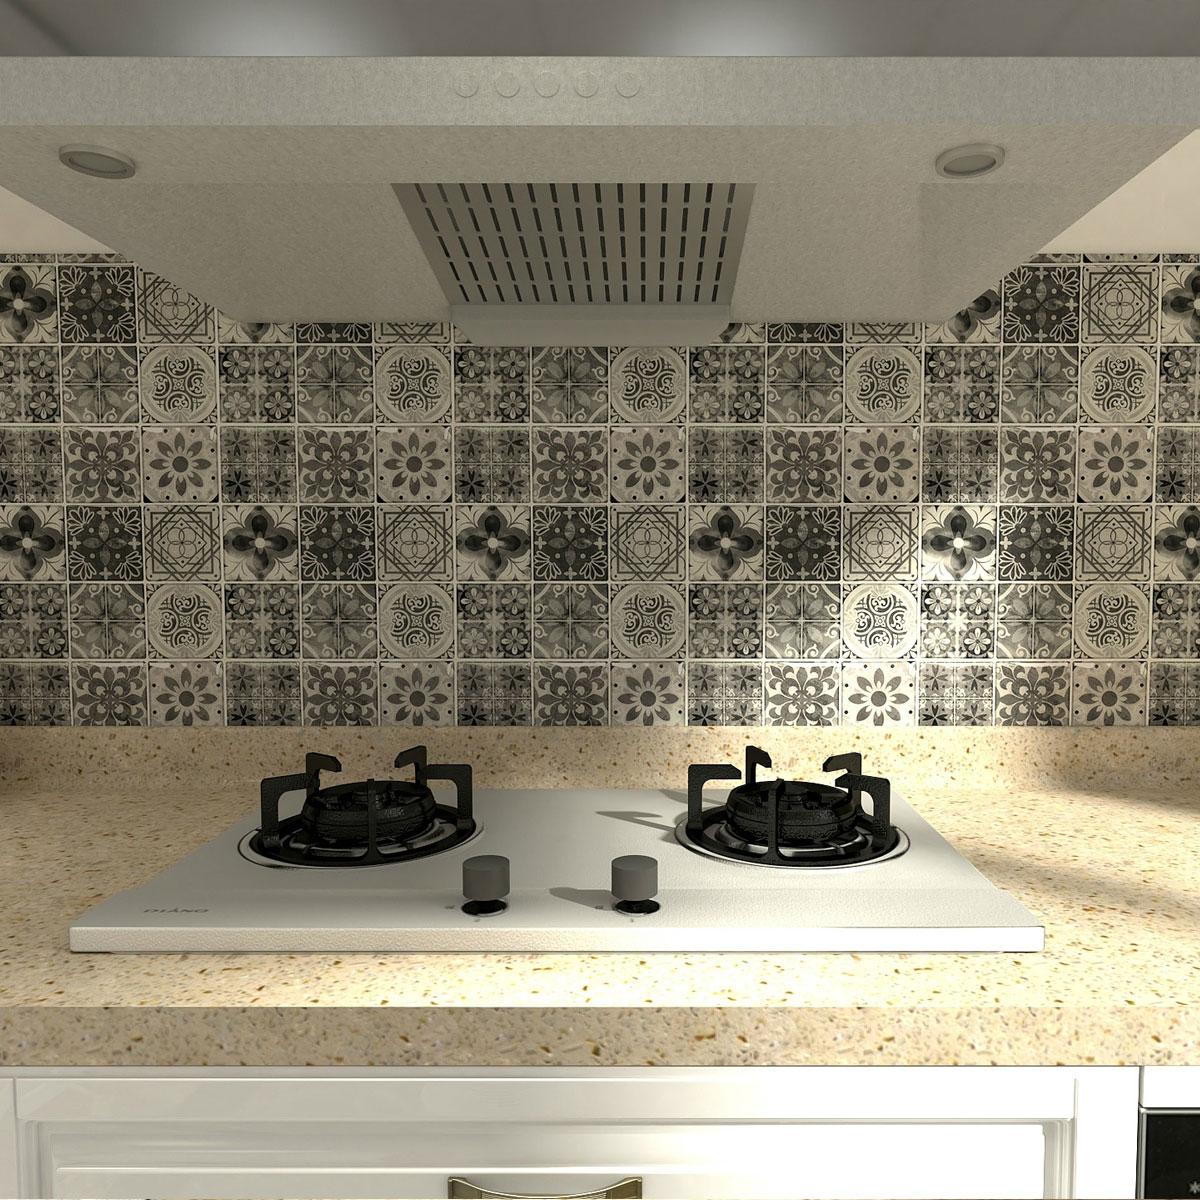 a17062 10 sheets peel and stick backsplash tile for kitchen gray talavera mexican tile